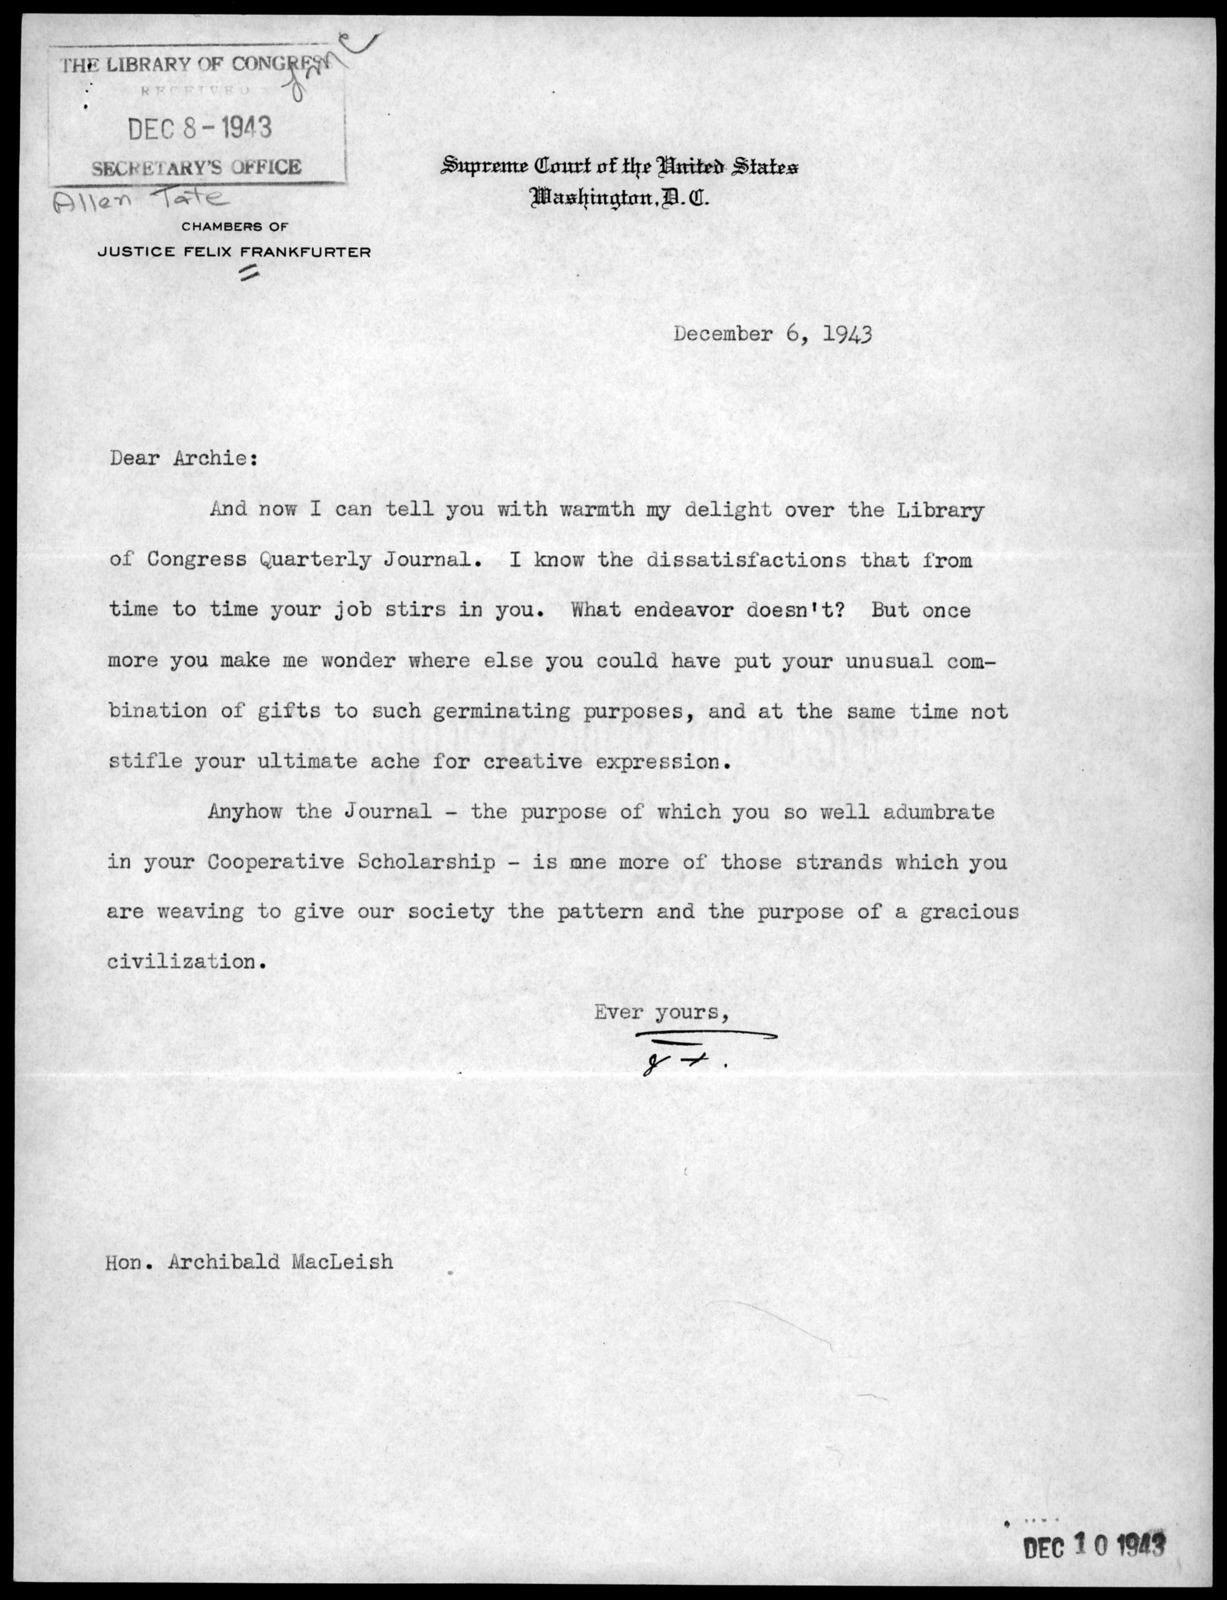 Letter from Felix Frankfurter to Archibald MacLeish, December 6, 1943